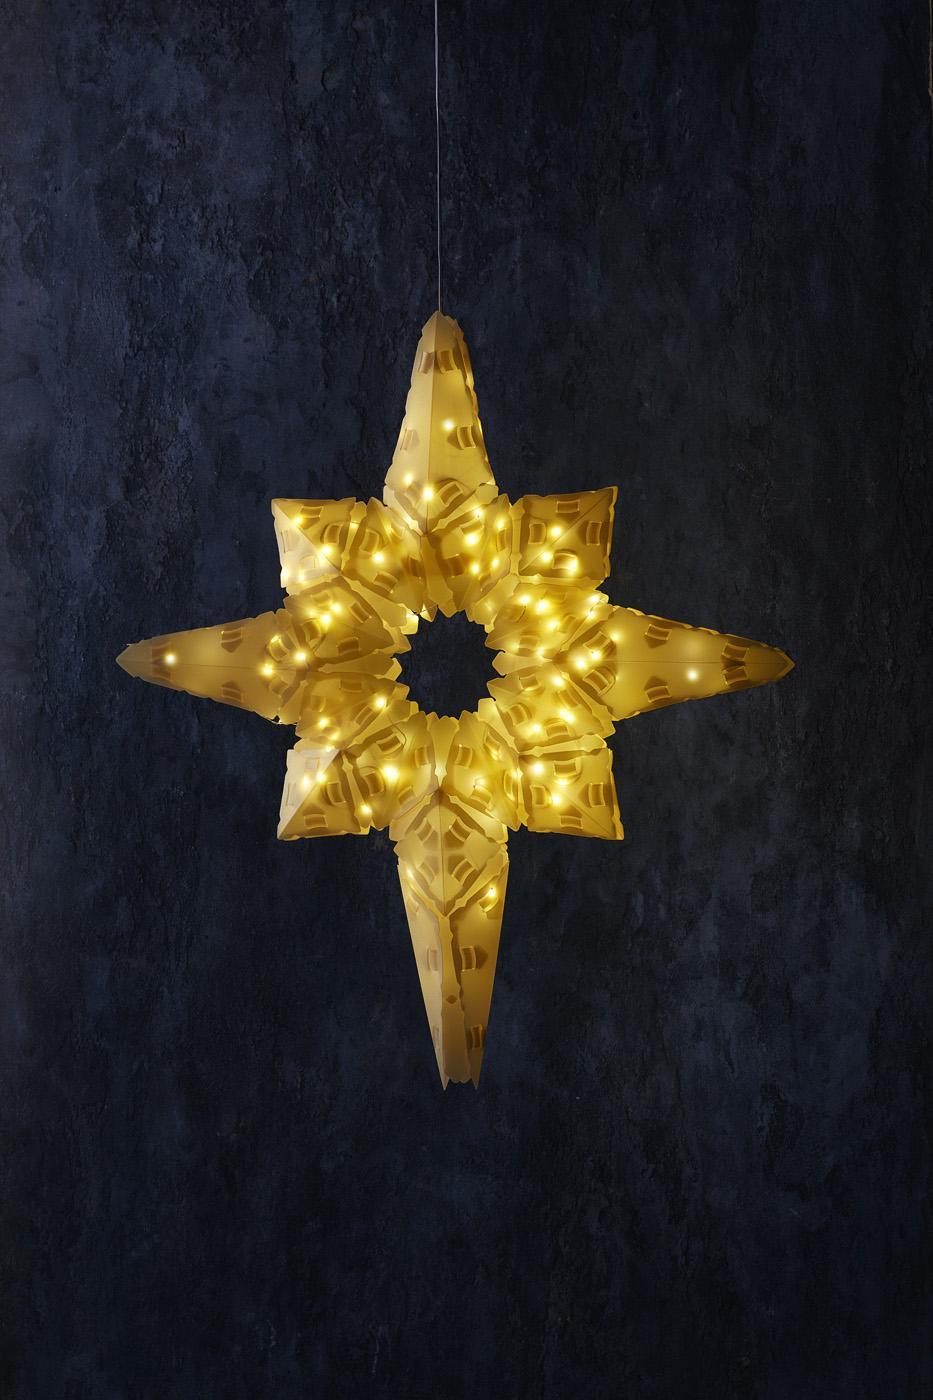 CREATTO_CHRISTMAS_LINE_GOLDEN_STAR_8_WARM_LIGHT.jpg